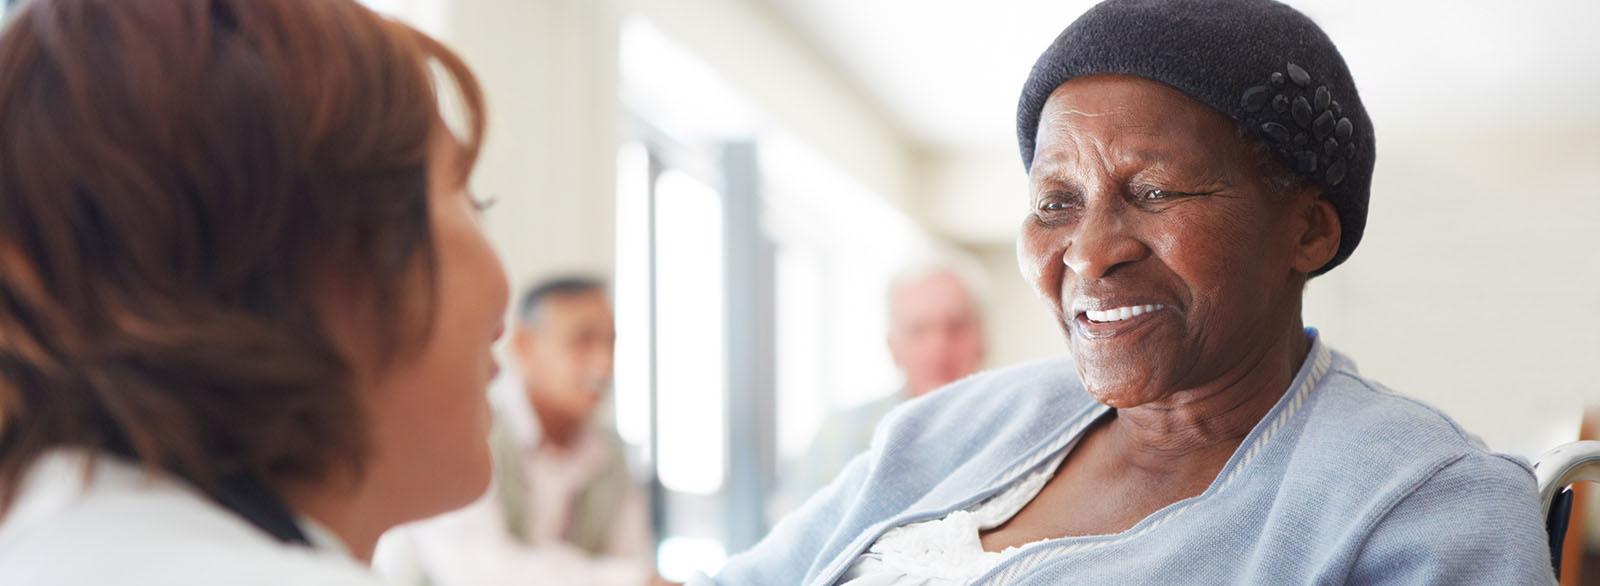 Provider speaking with elderly female patient